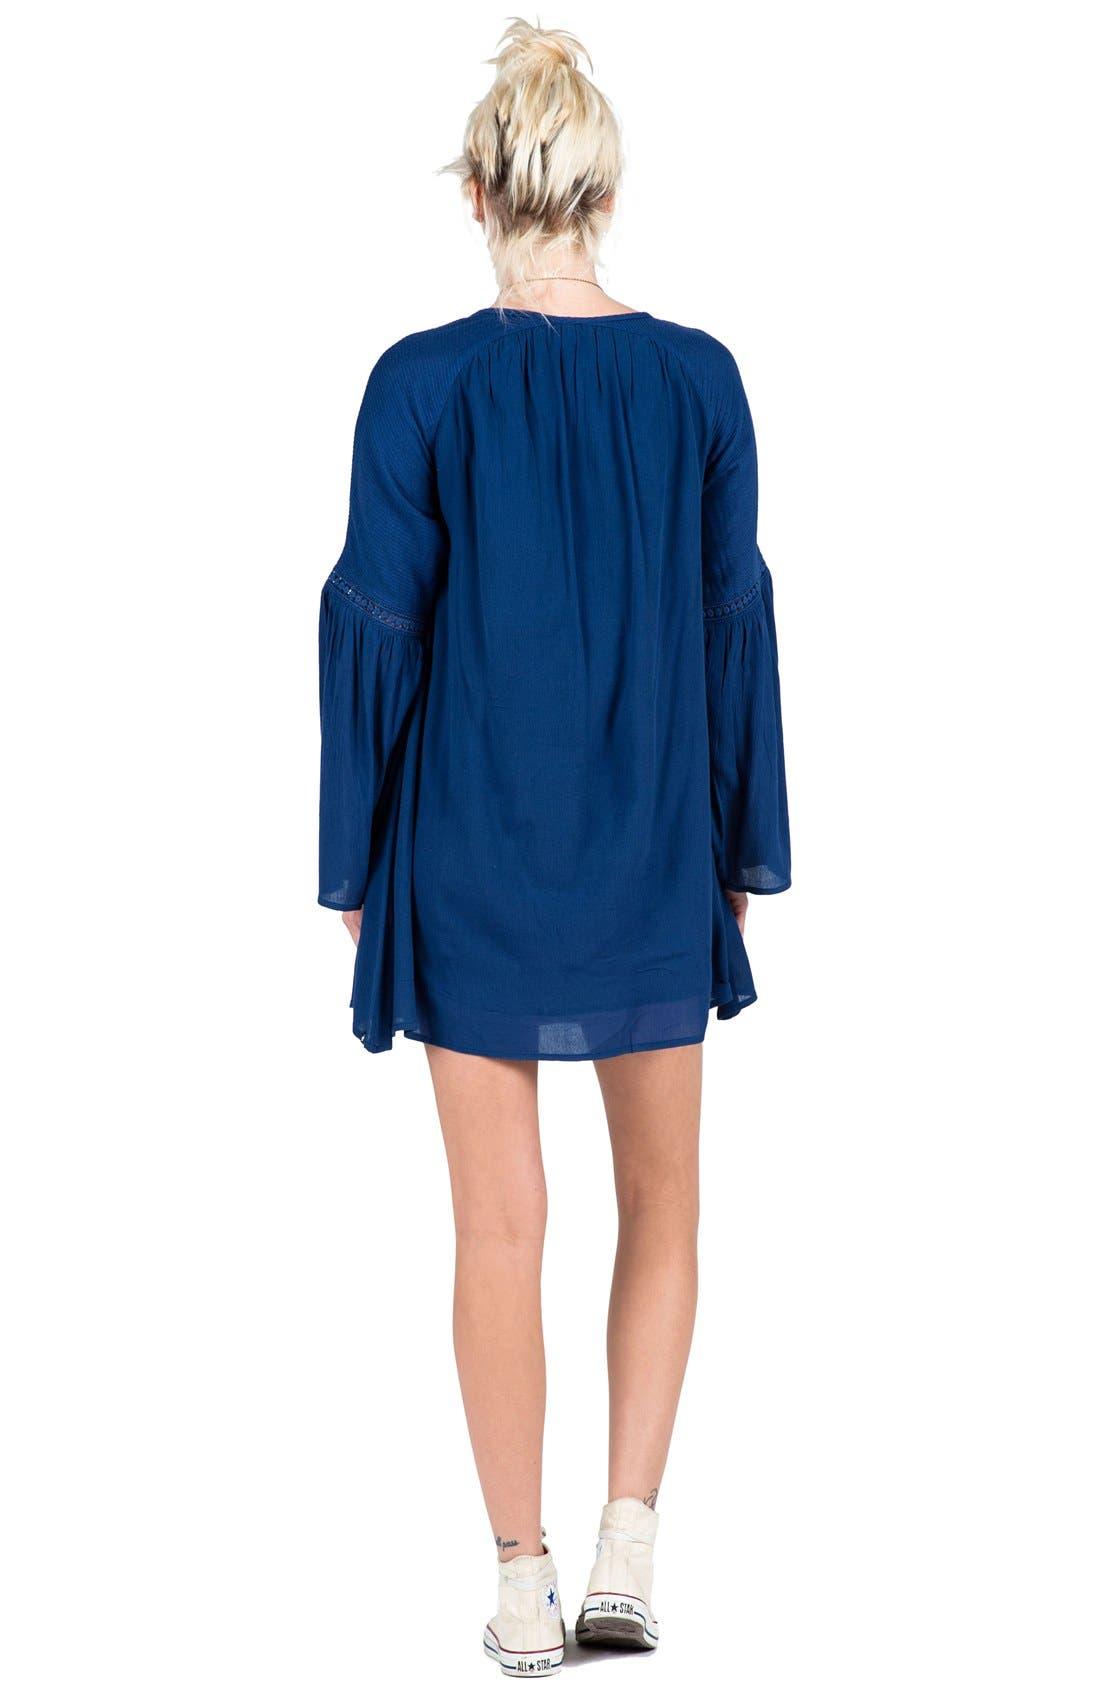 VOLCOM, 'Peaceazy' Babydoll Dress, Alternate thumbnail 3, color, 410